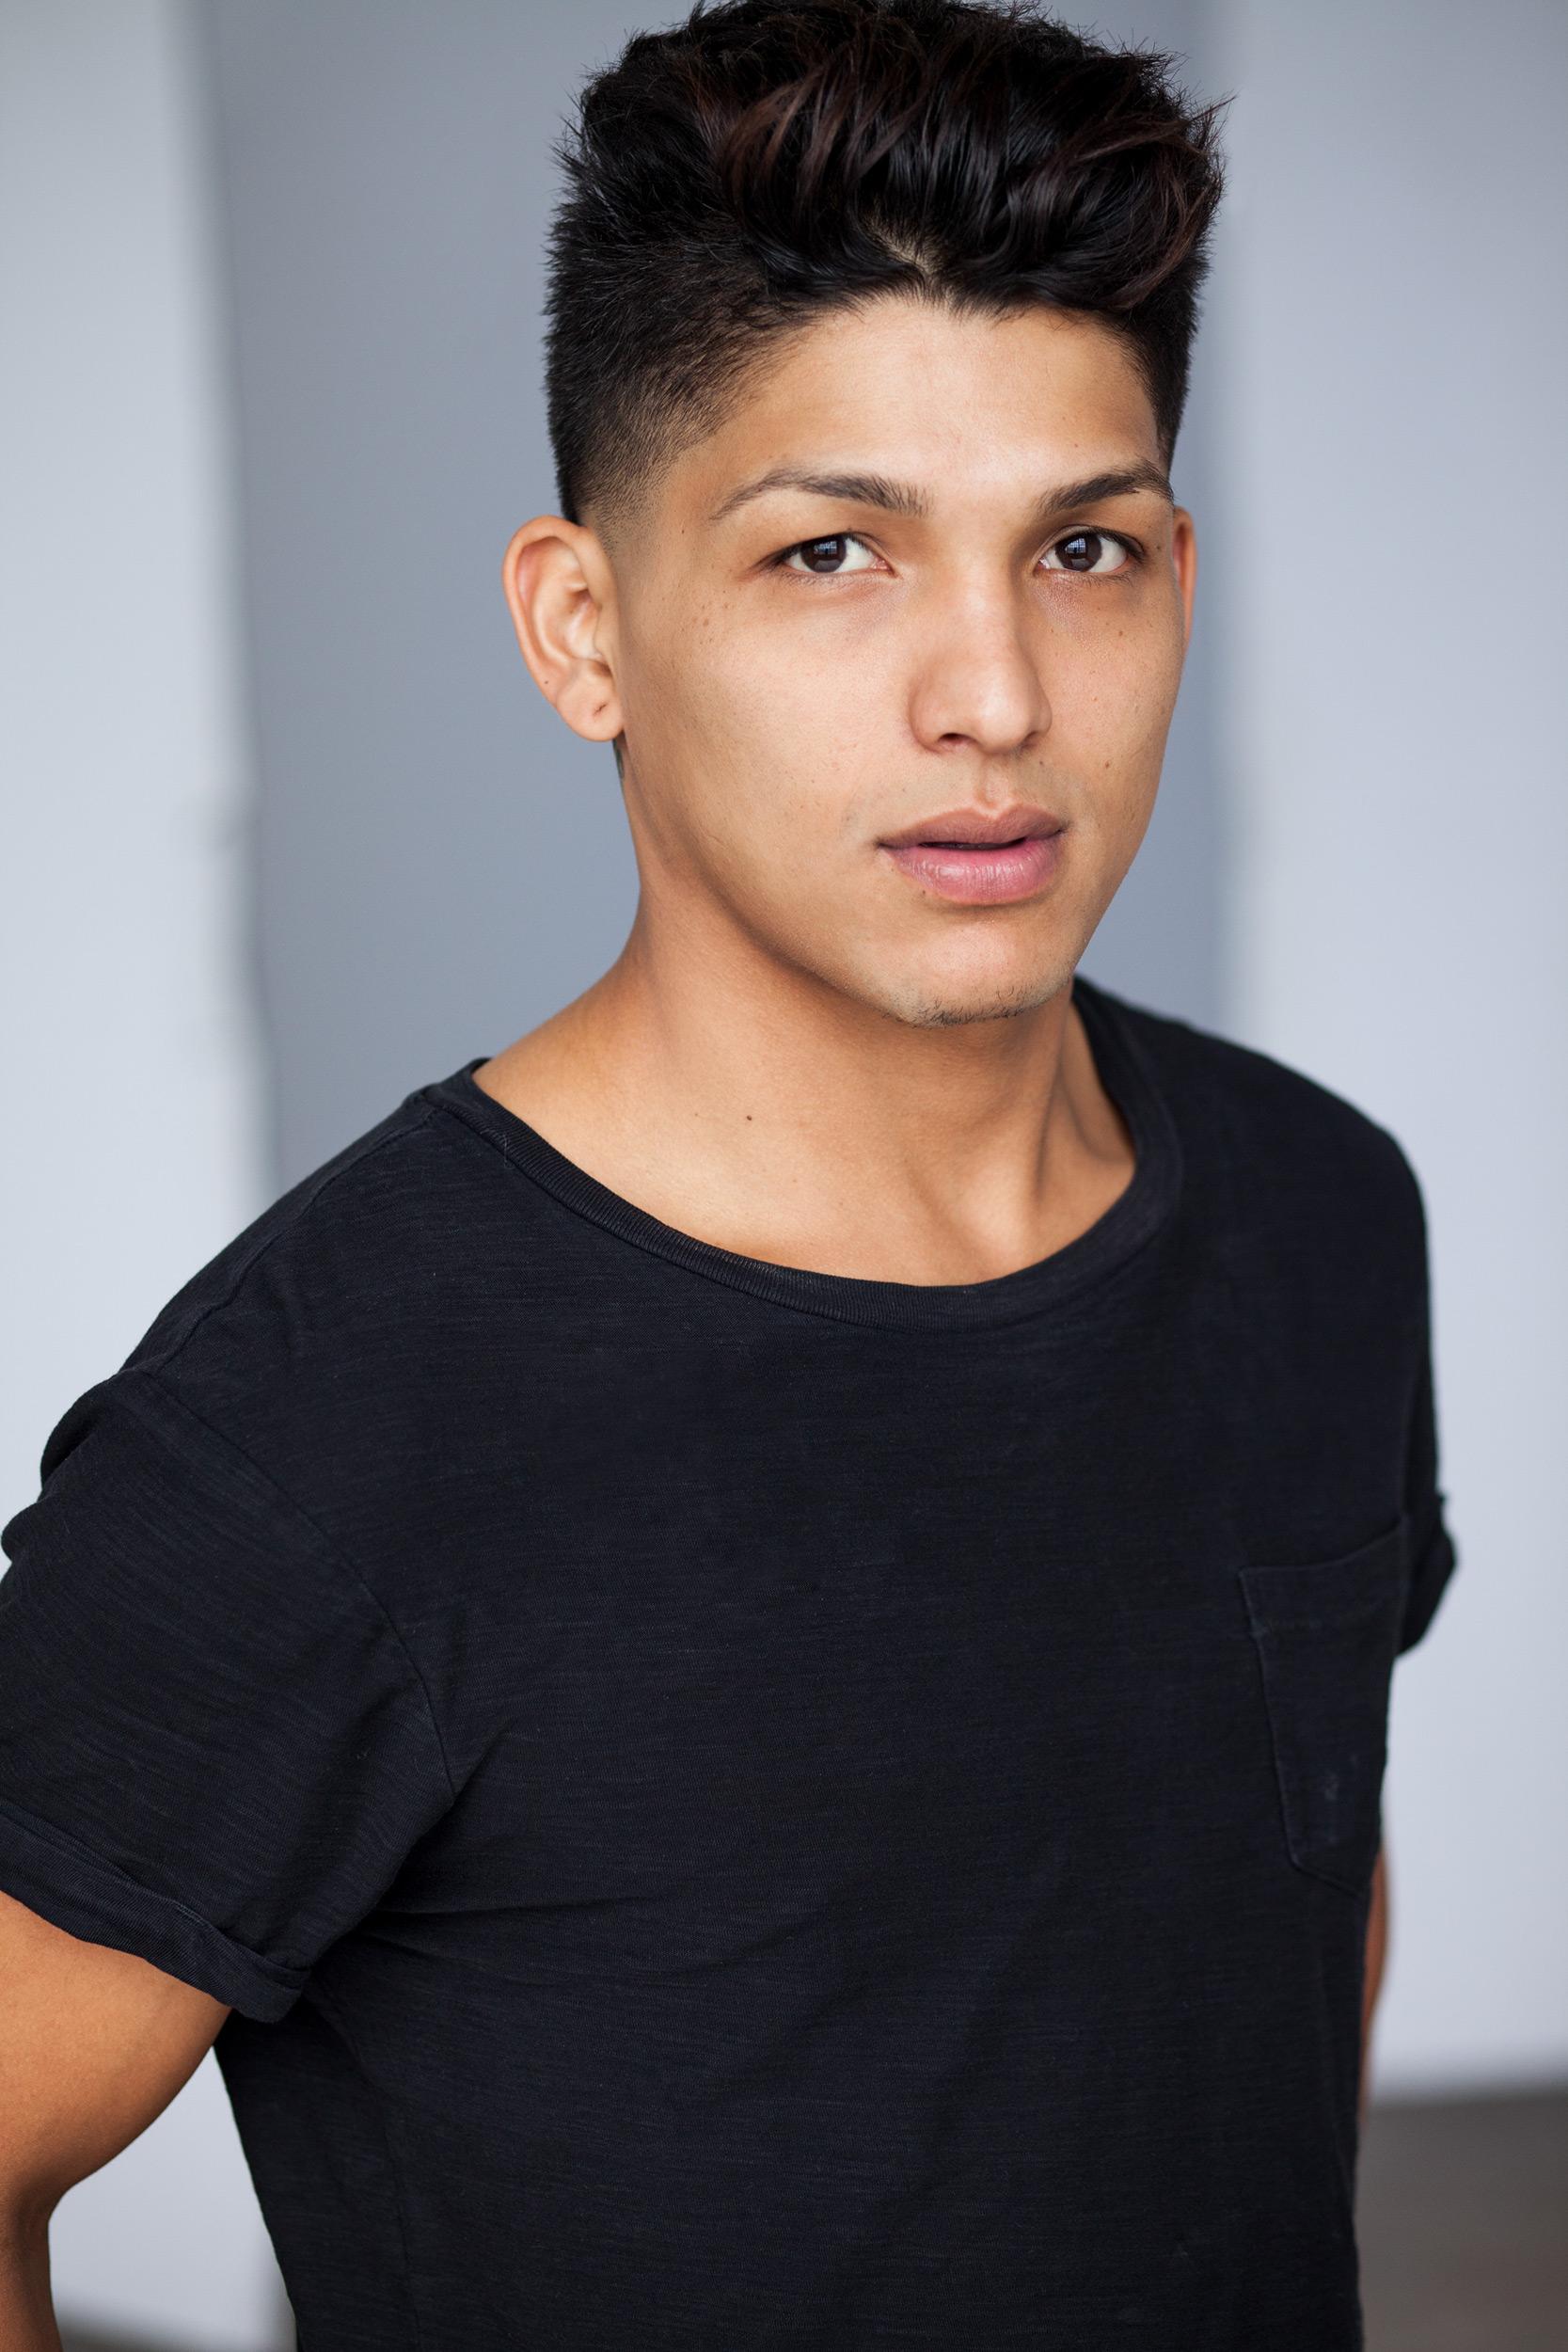 Drew_Micah_model_actor.jpg